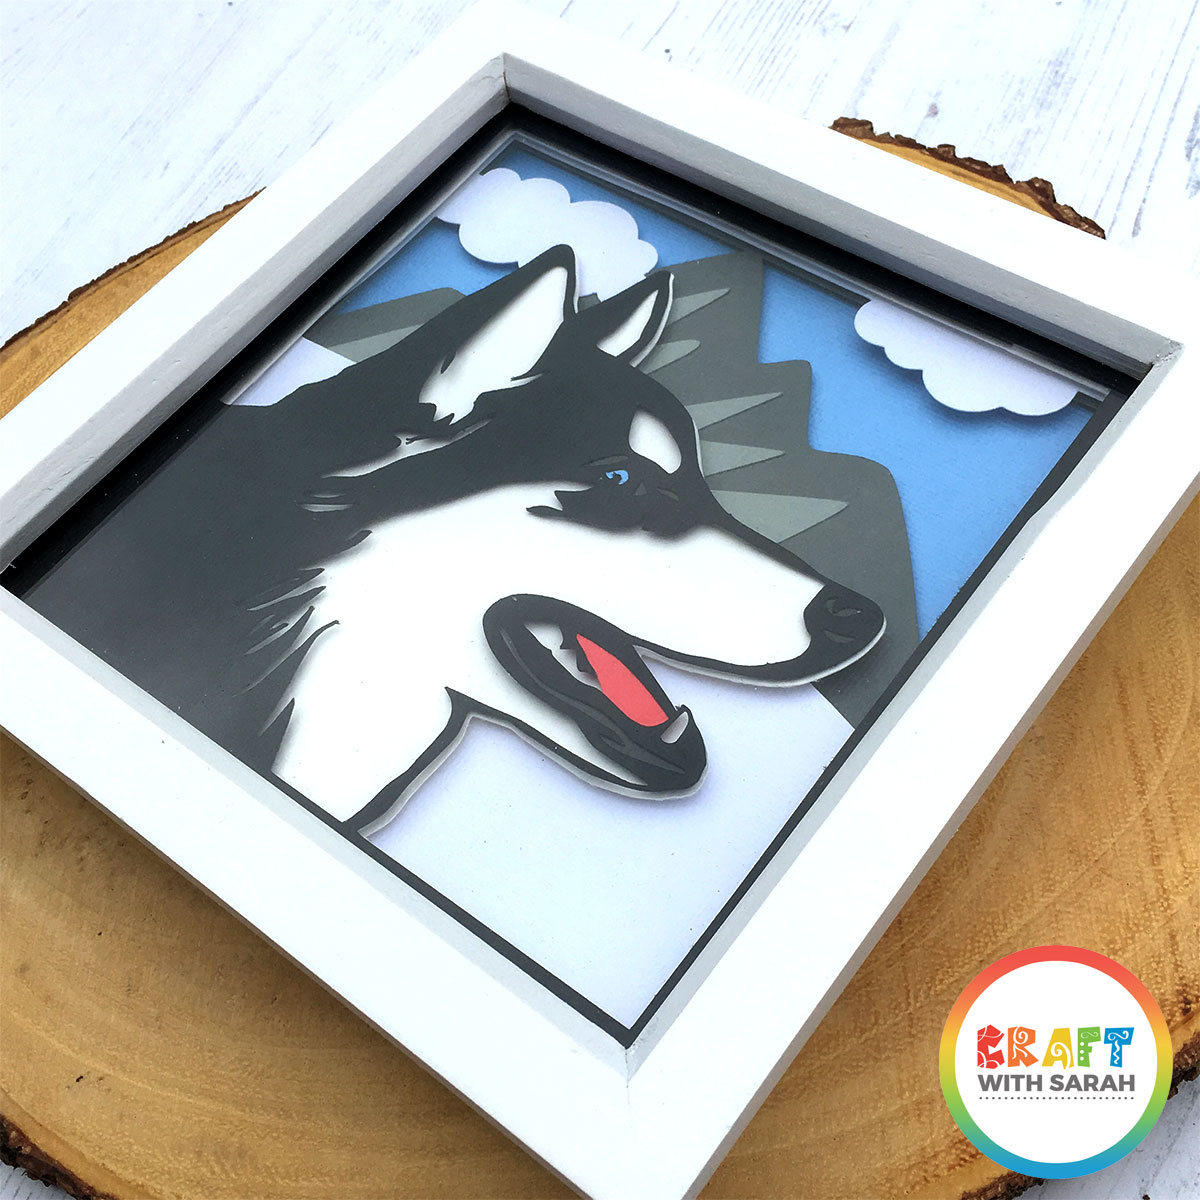 Cricut husky shadow box frame template with free SVG file